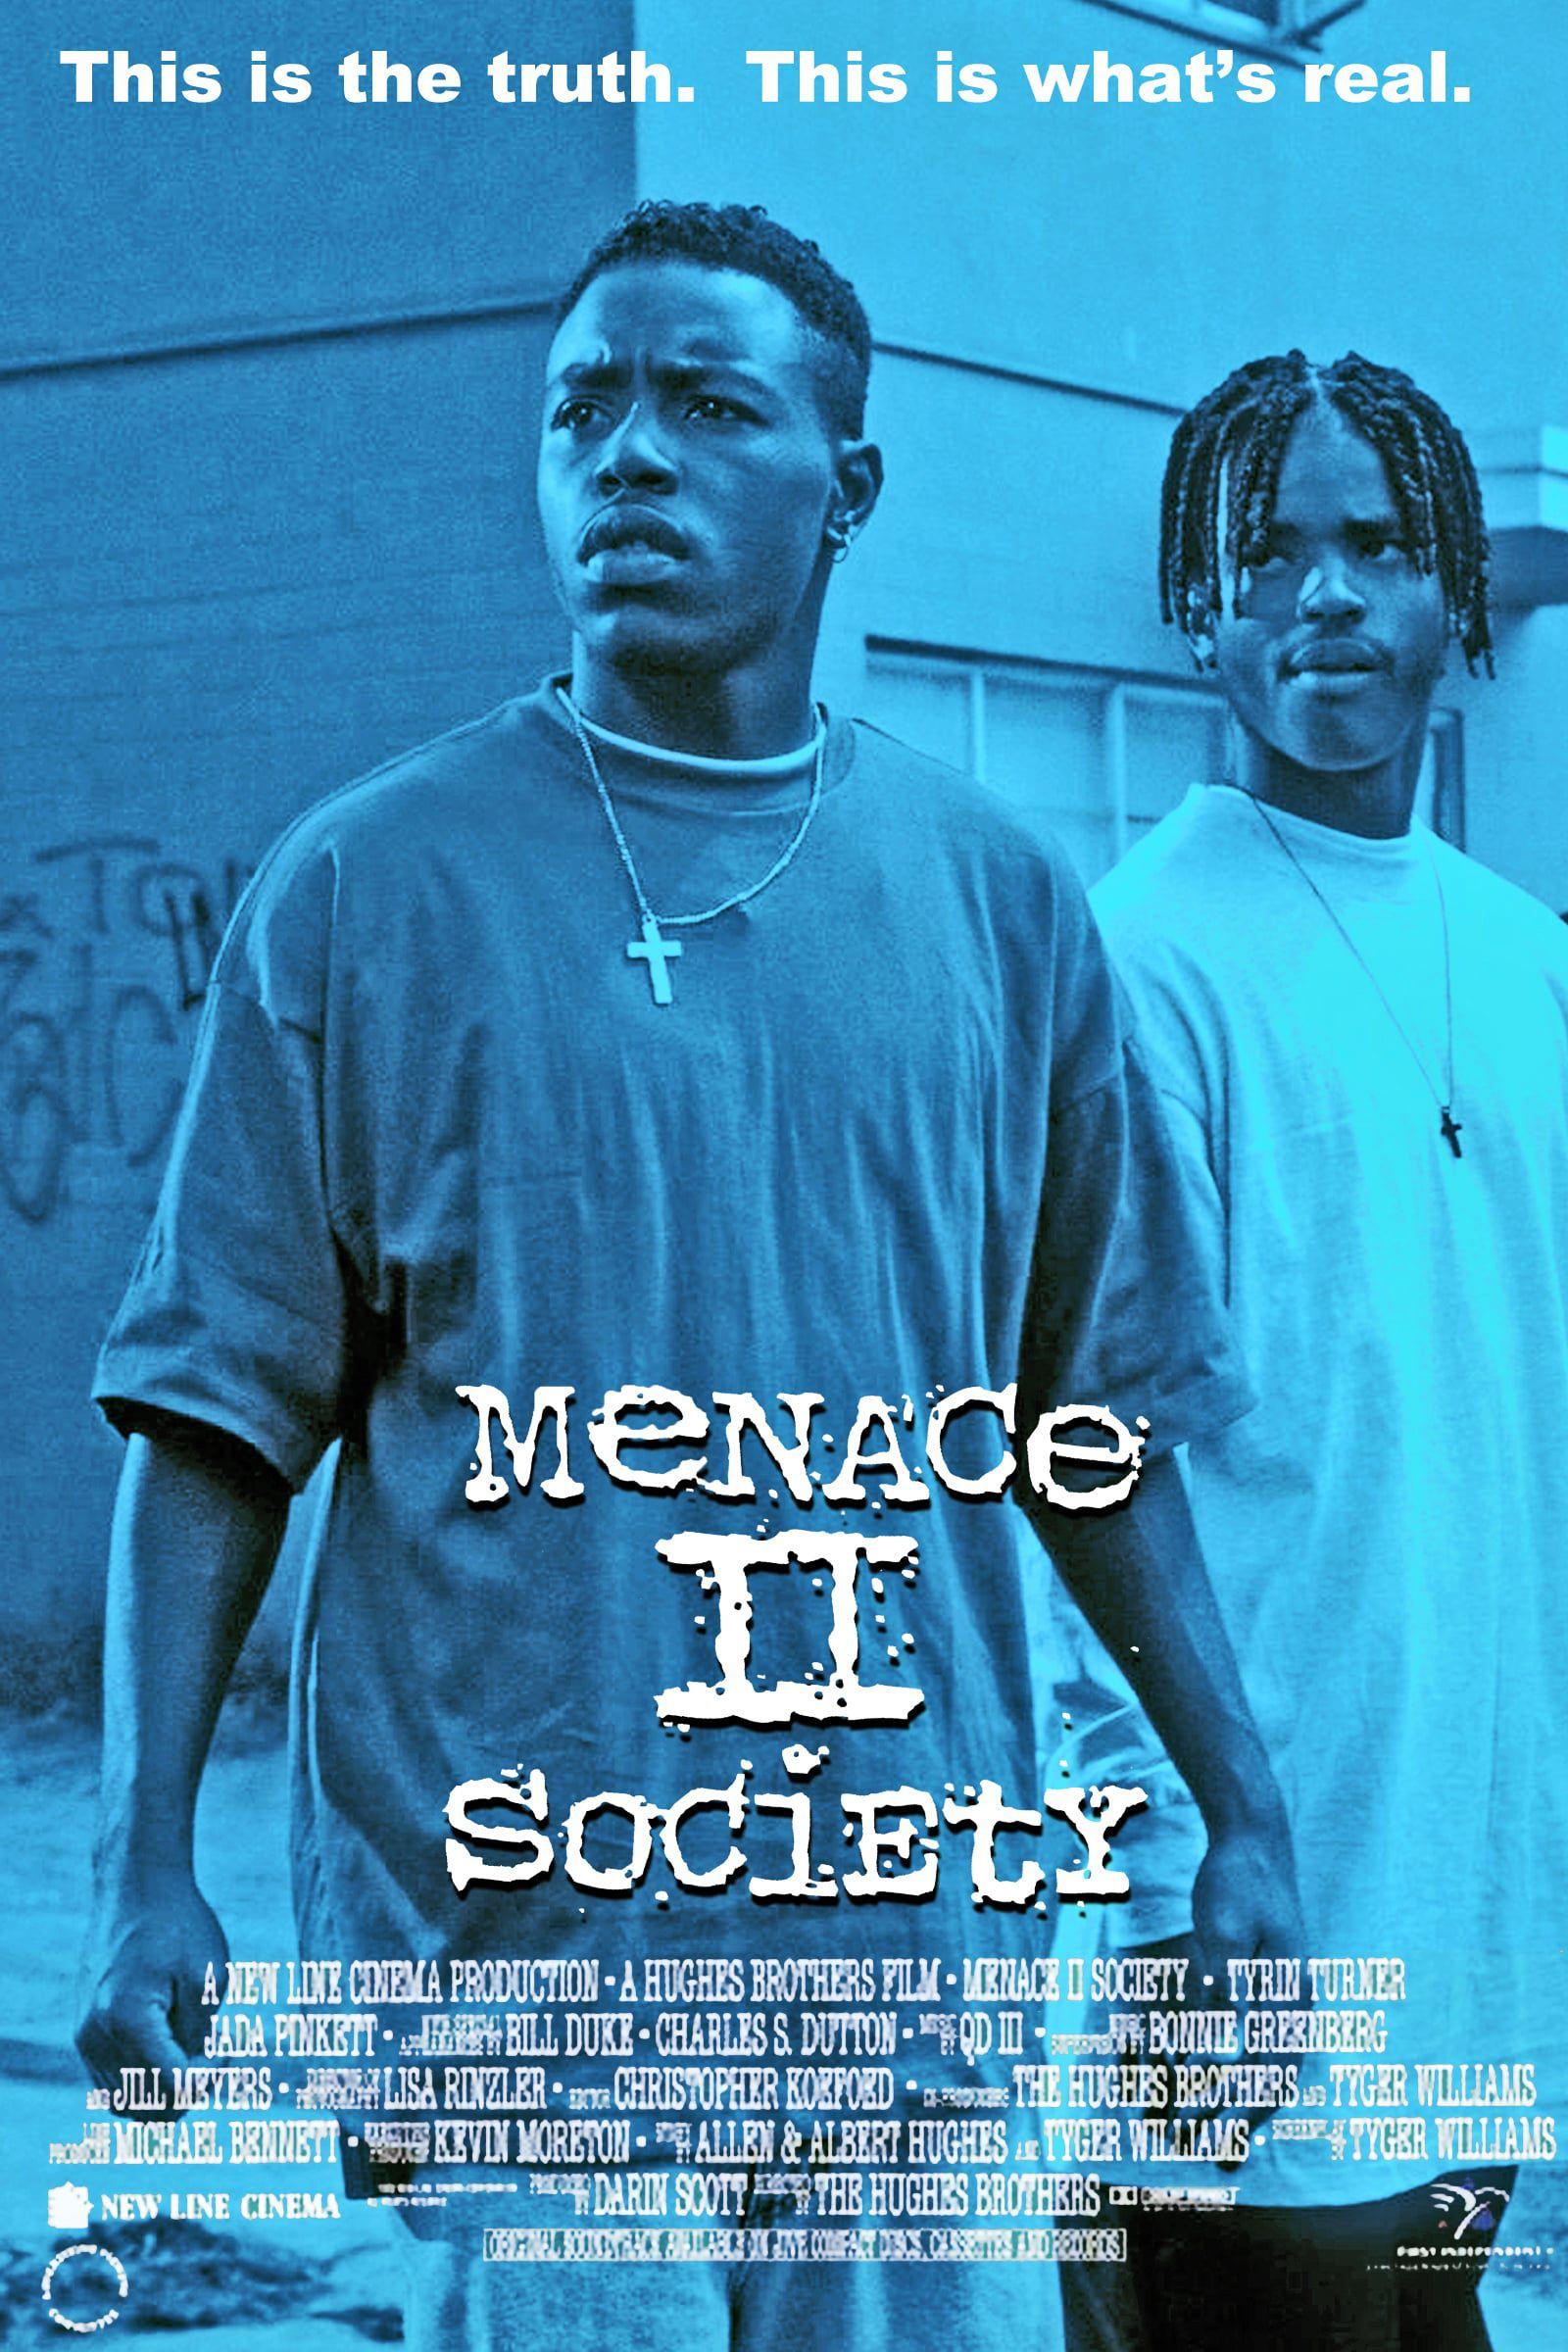 Menace II society (1993) d'Albert et Allen Hughes